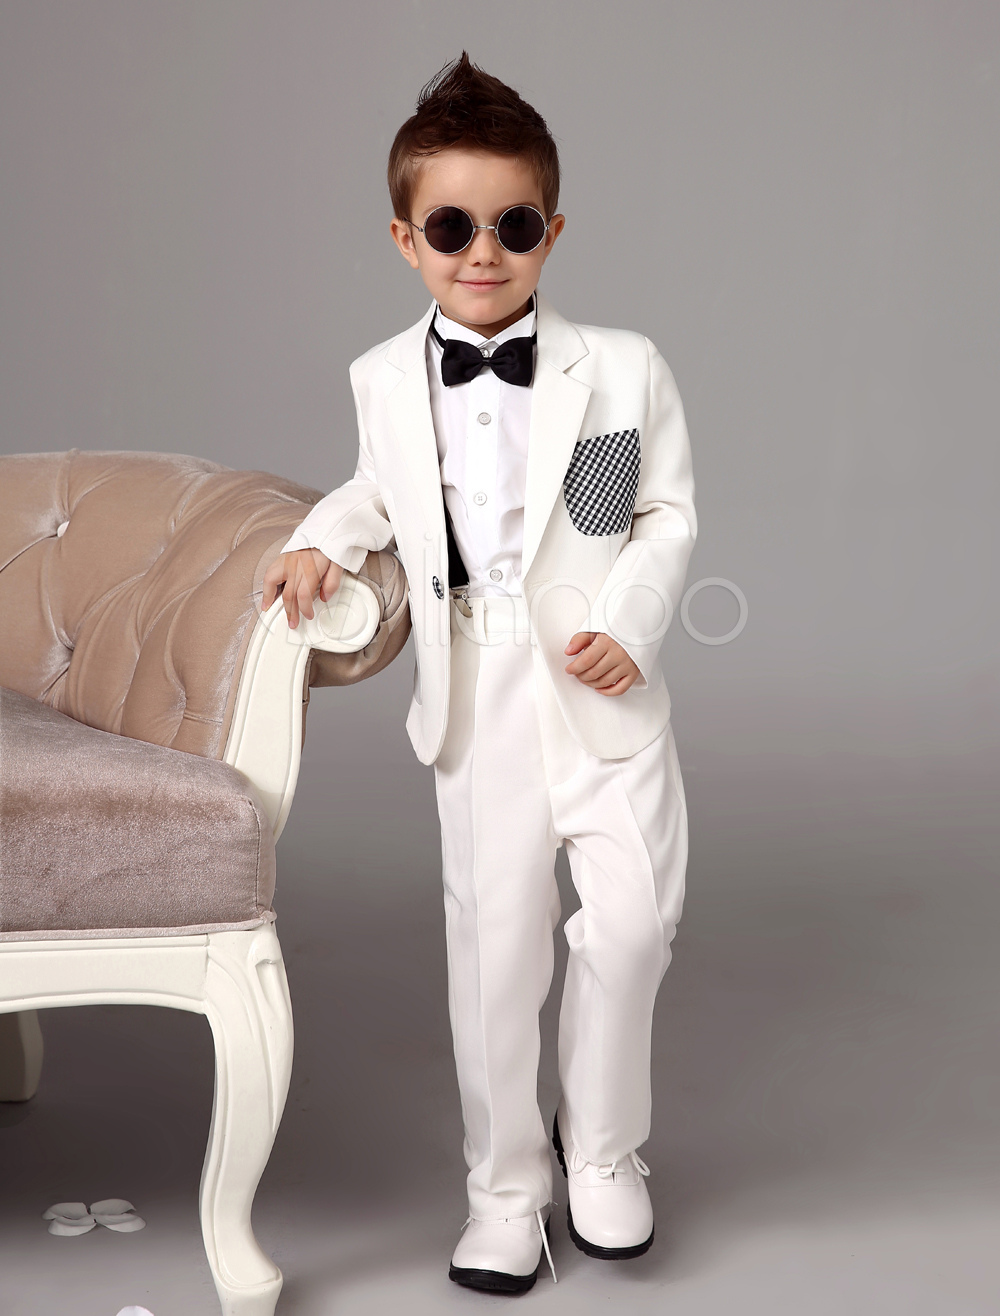 Buy White Boy Suit Wedding Tuxedo Jacket Pants Shirts Bow Tie Kids Formal Wear 4 Pcs Ring Bearer Suit Set for $62.99 in Milanoo store